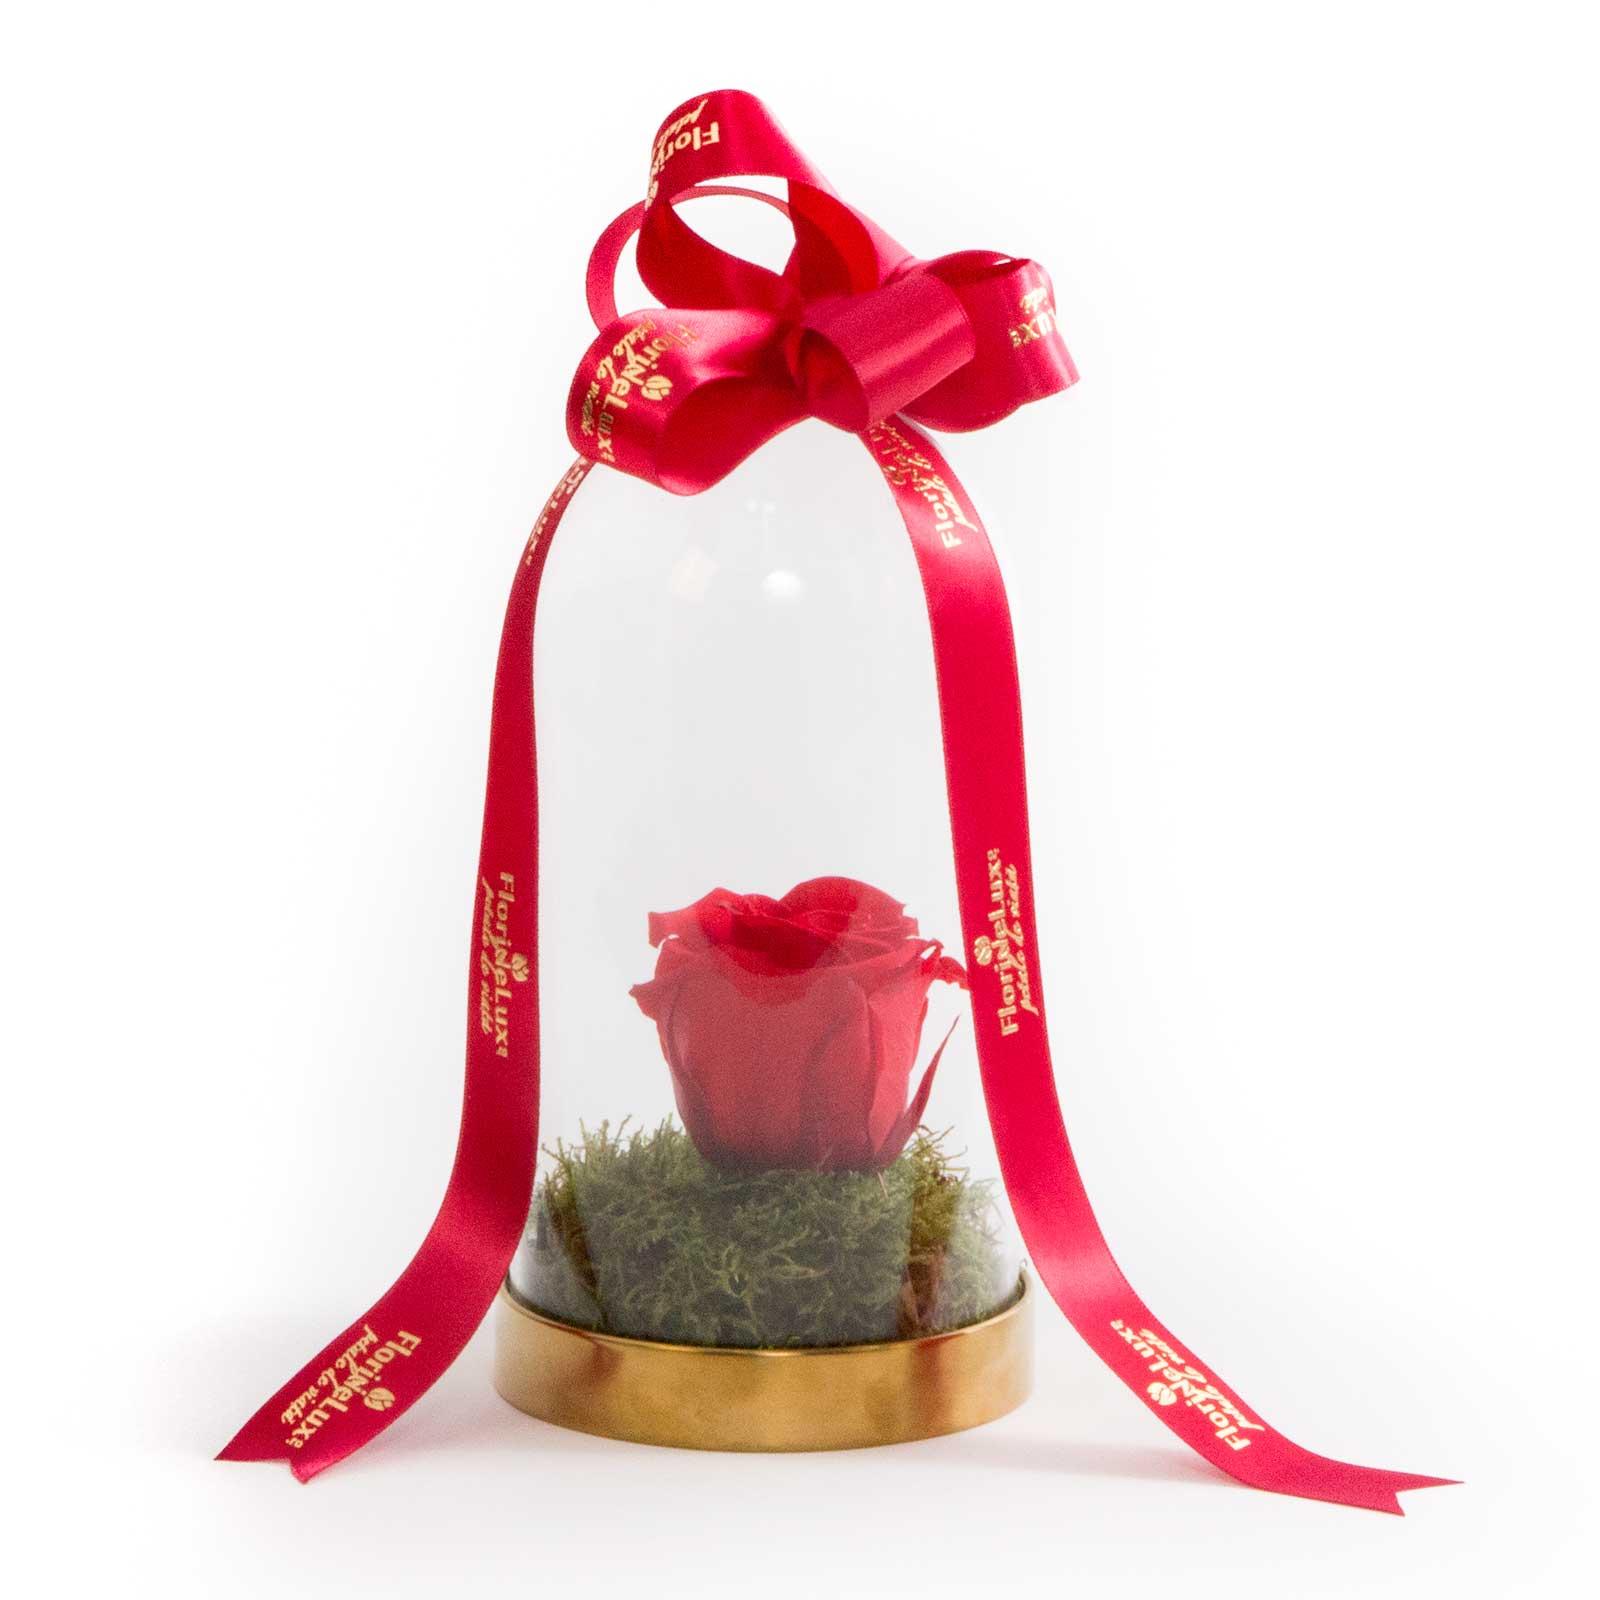 Trandafiri criogenati cadou Ziua Indragostitilor